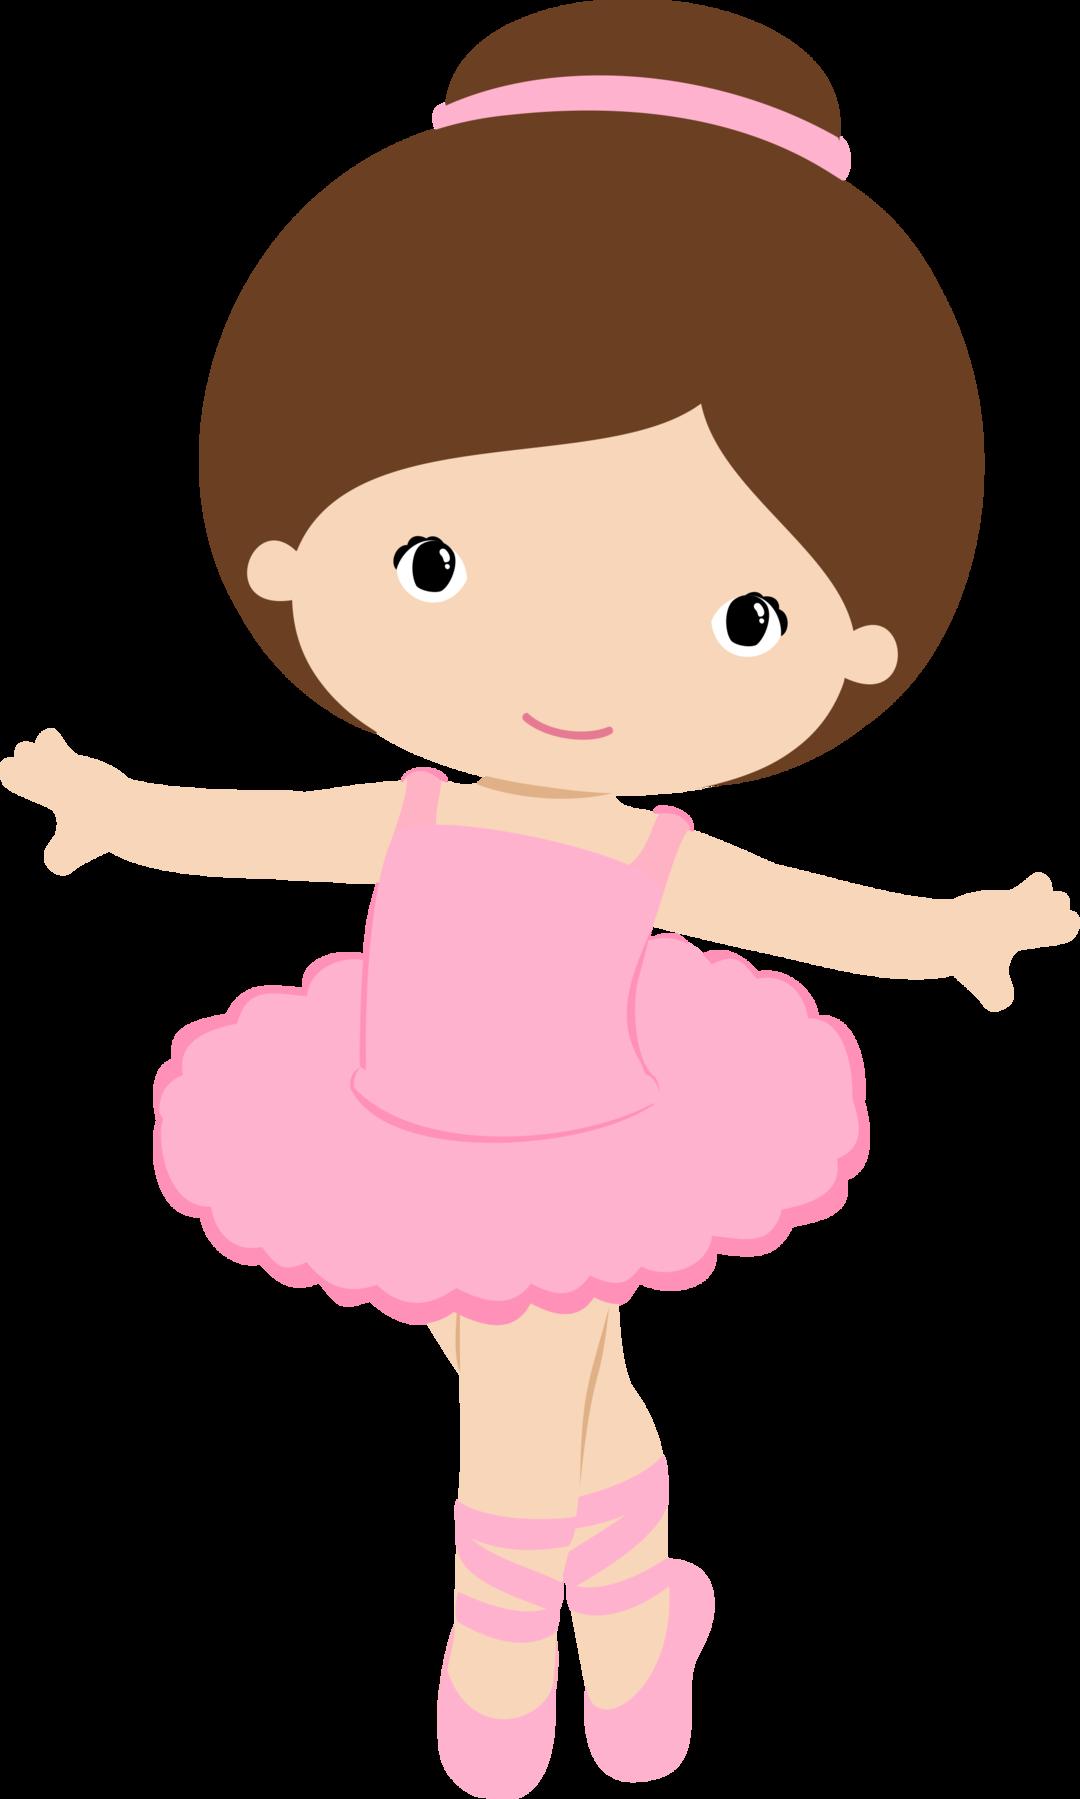 Ballerine clipart cute person Cute ballerina pasta as